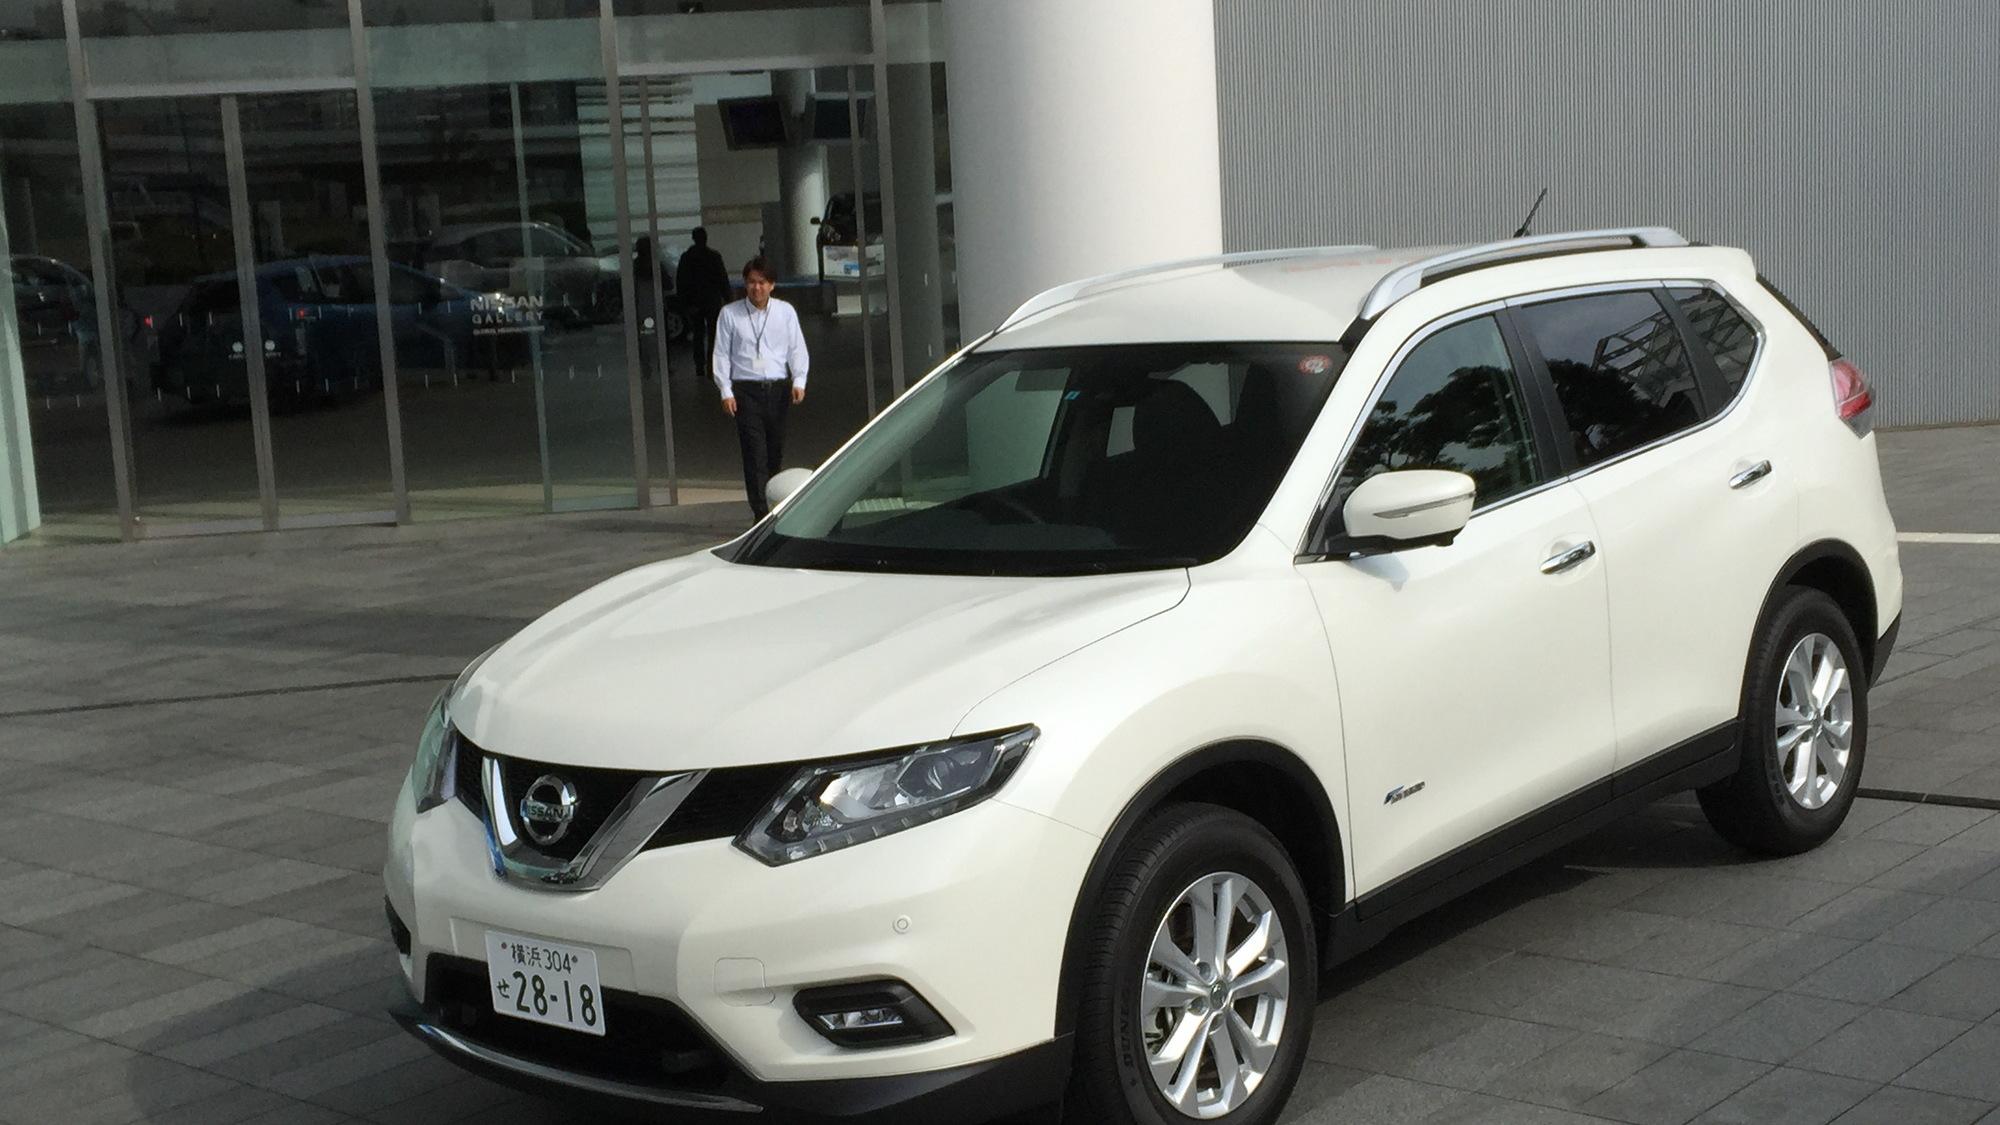 Nissan X-Trail Hybrid (Japanese-spec)  -  Quick Drive, November 2015